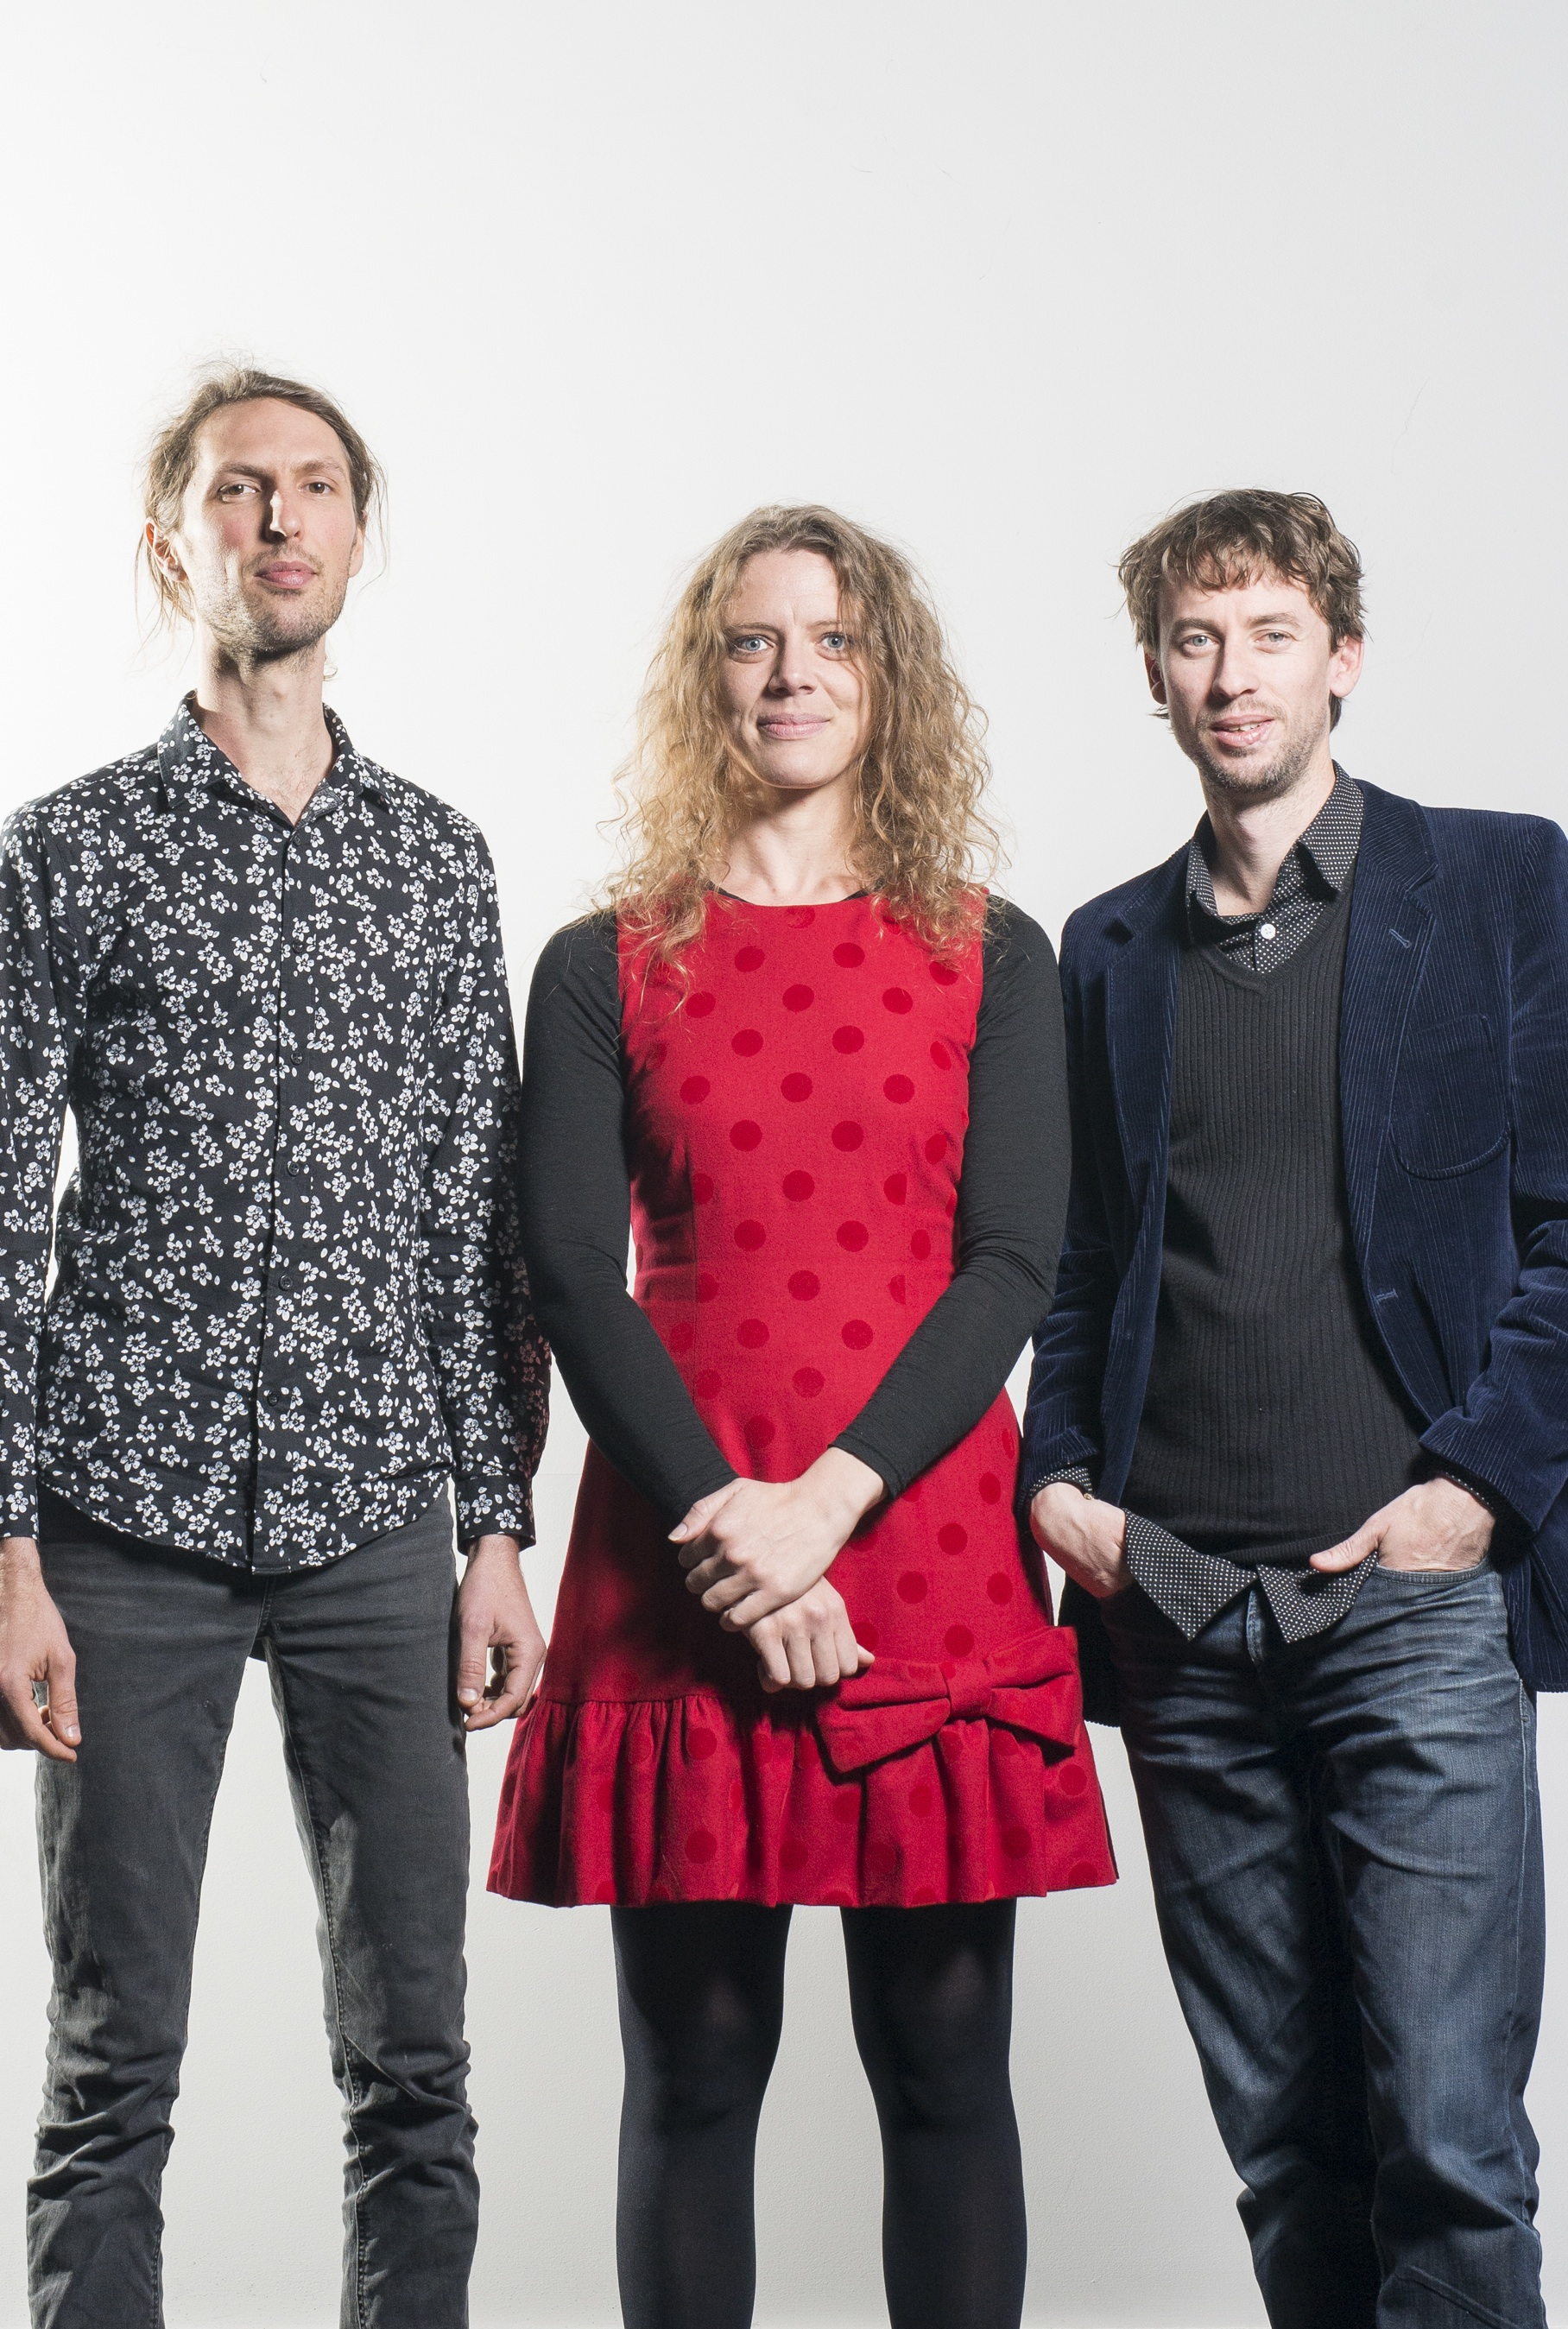 BFK Trio |Kristin Berardi, Sean Foran and Rafael Karlen - thursday january 24, 2019#LIVEATDUST #JAZZATdustLEARN MORE